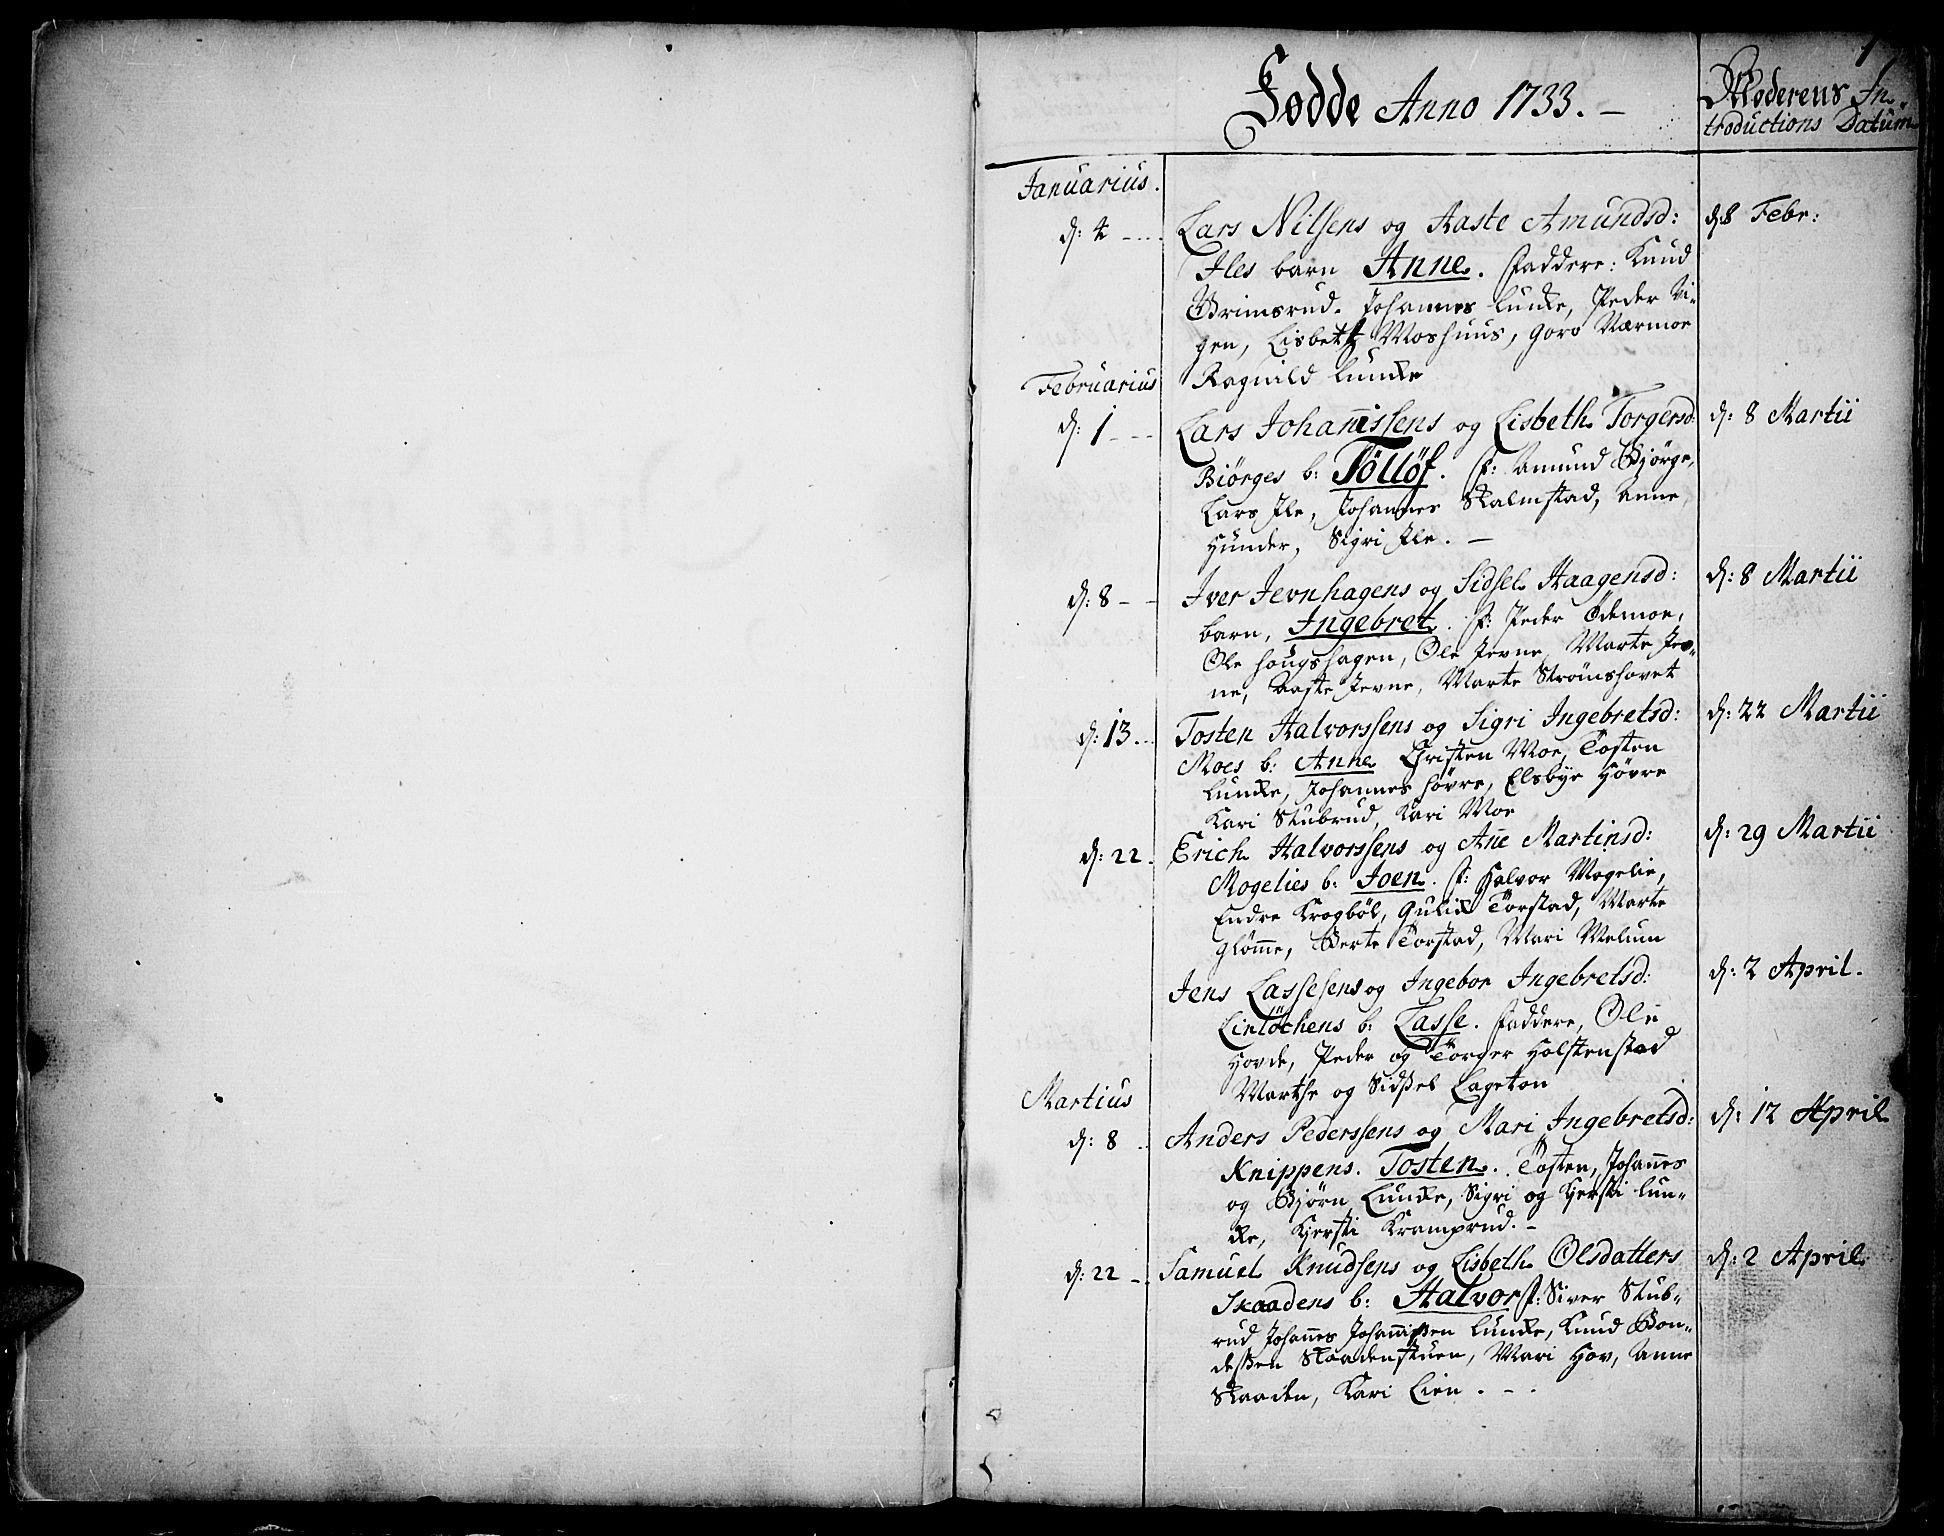 SAH, Øyer prestekontor, Ministerialbok nr. 2, 1733-1784, s. 0-1